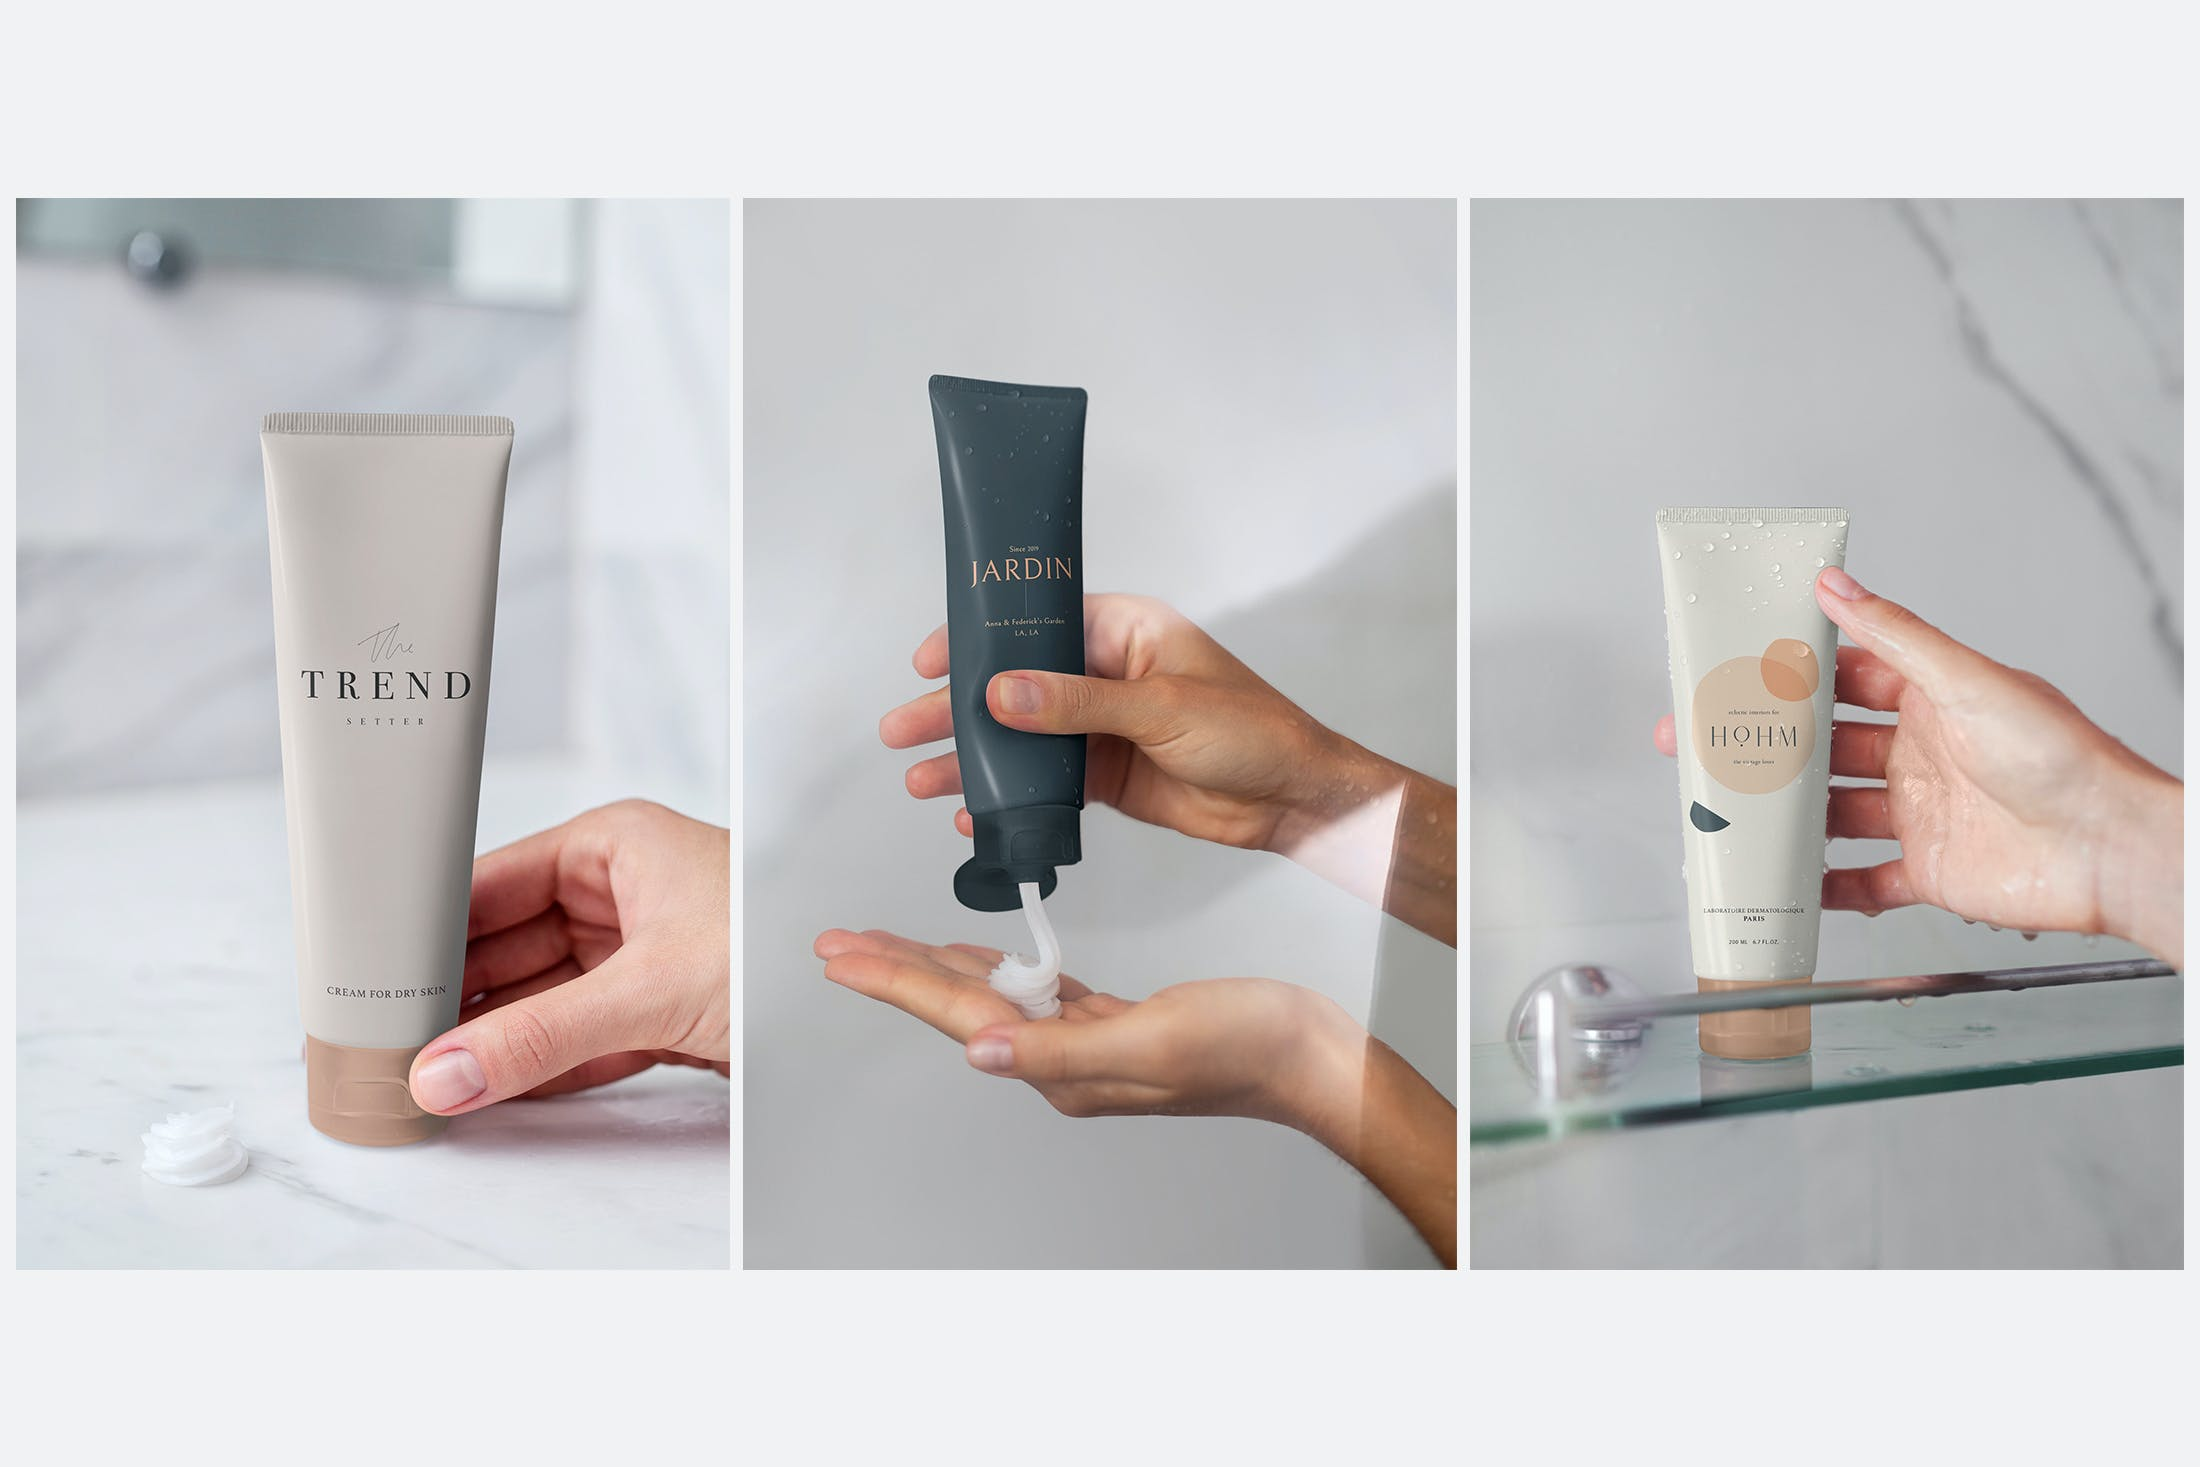 6款化妆品护手霜洗面奶包装样机模板 Cosmetic Mockup Cream Tube Bathroom插图(2)